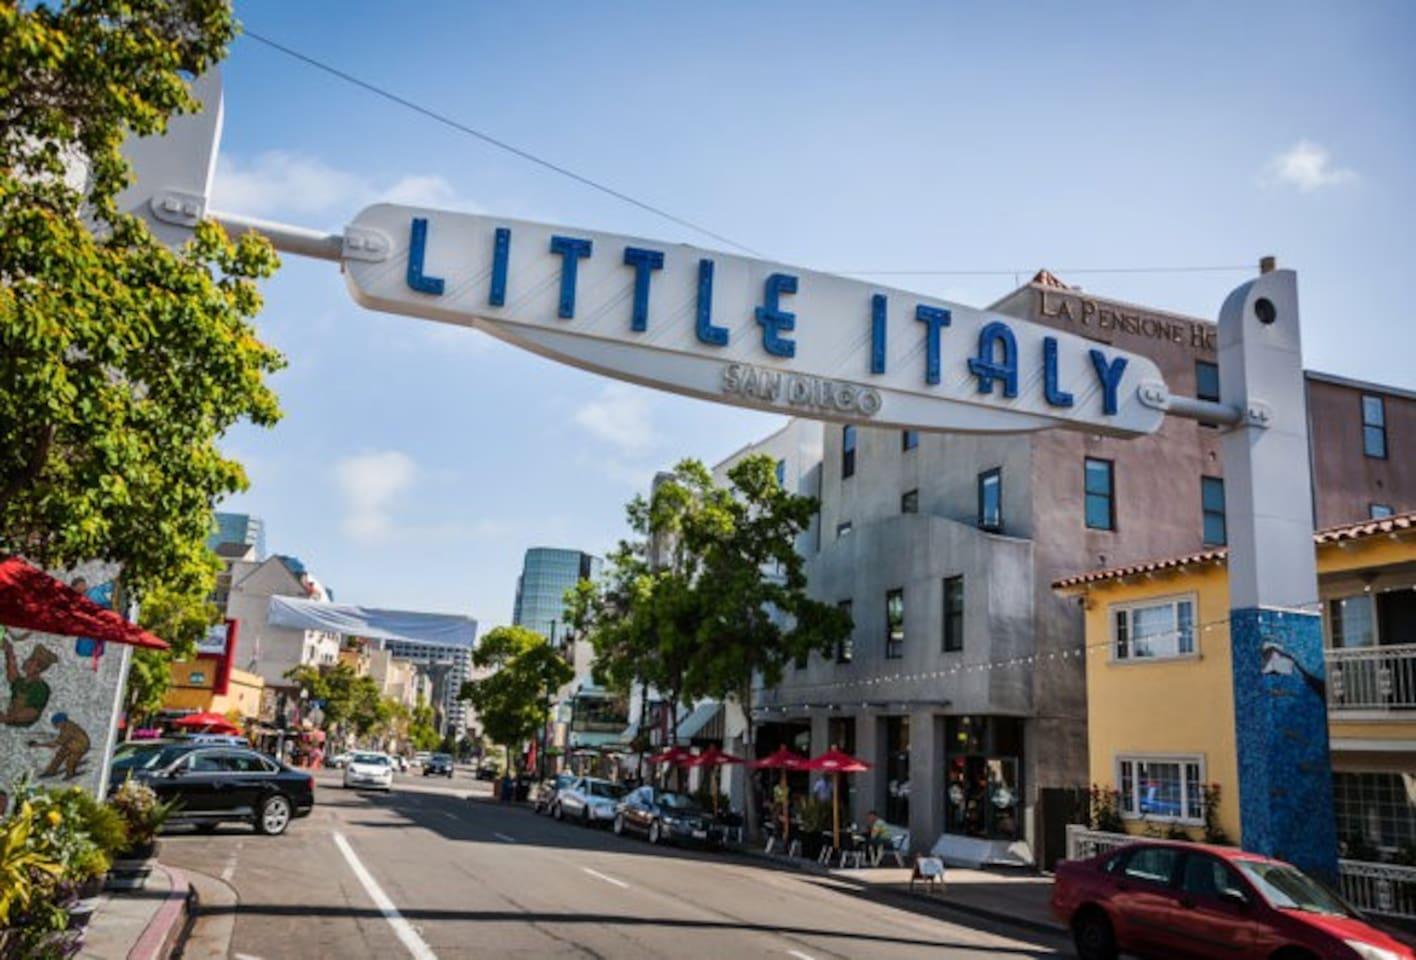 In the center of trendiest neighborhood of San Diego